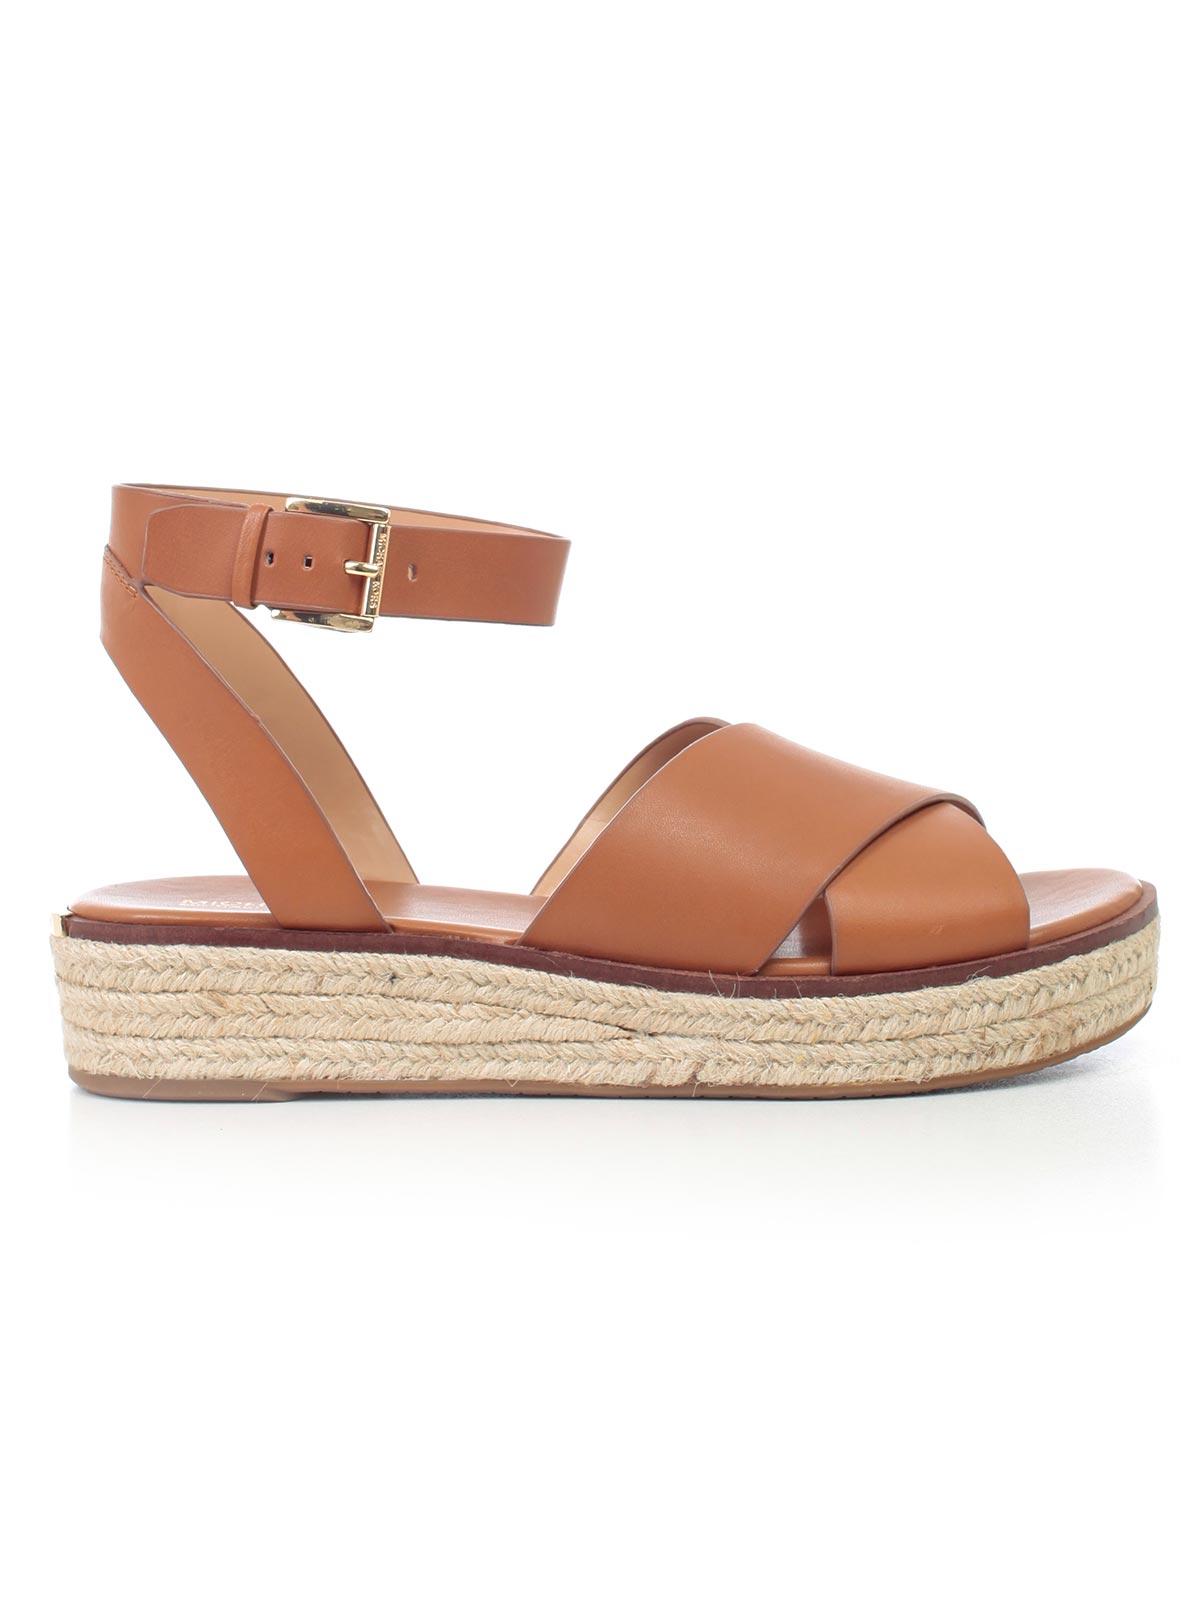 c3e9888bcd0db4 Michael Michael Kors Shoes 40S9ABFA1L - 203 ACORN.Bernardelli Store ...